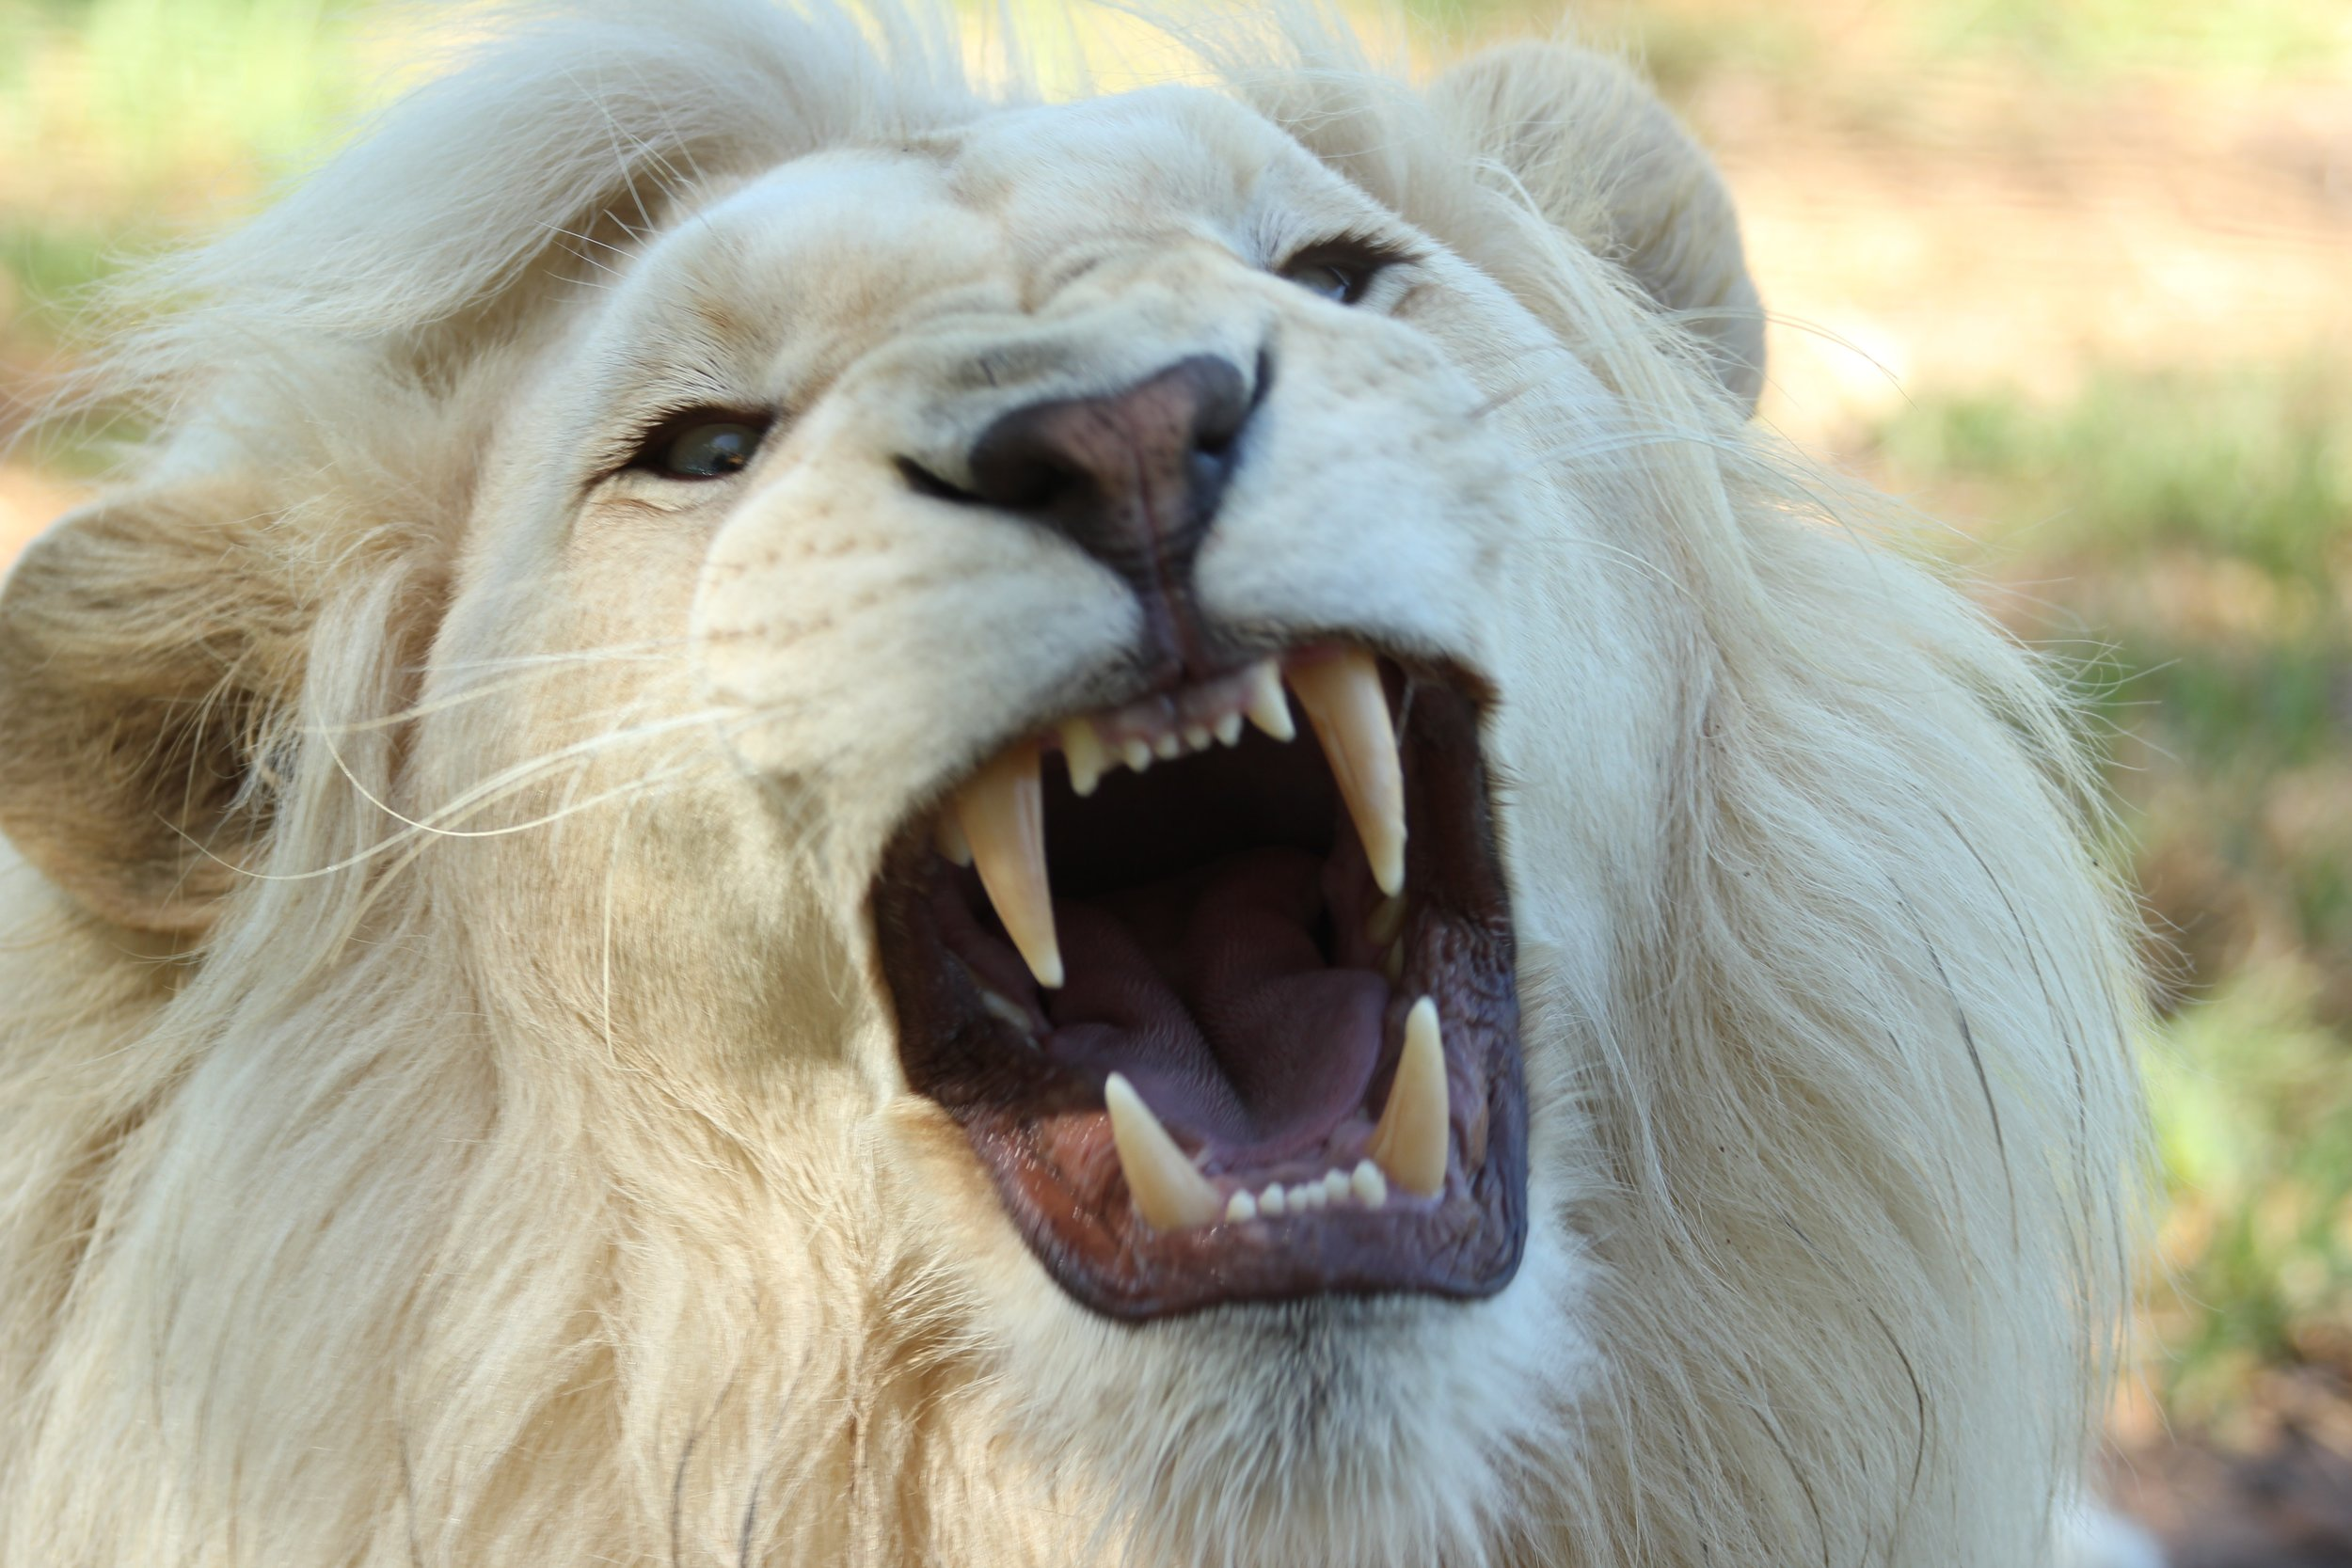 Animal mouths are just sooooo much cuter.